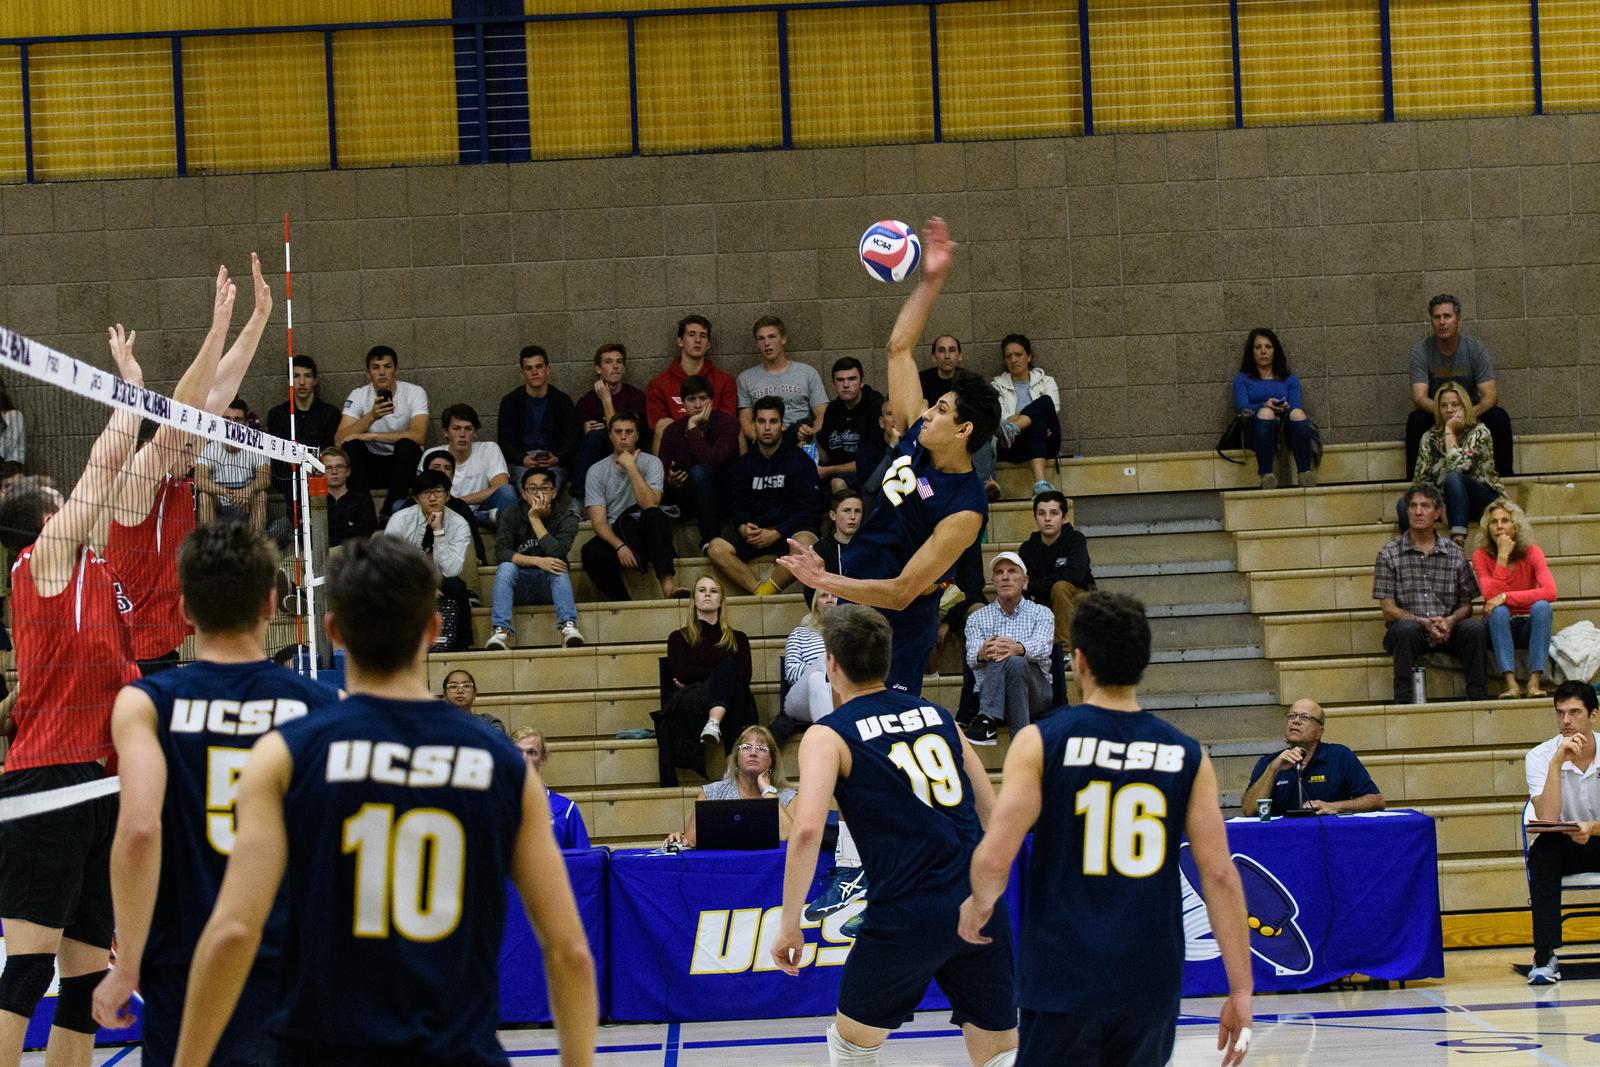 Corey Chavers swings over the CSUN block